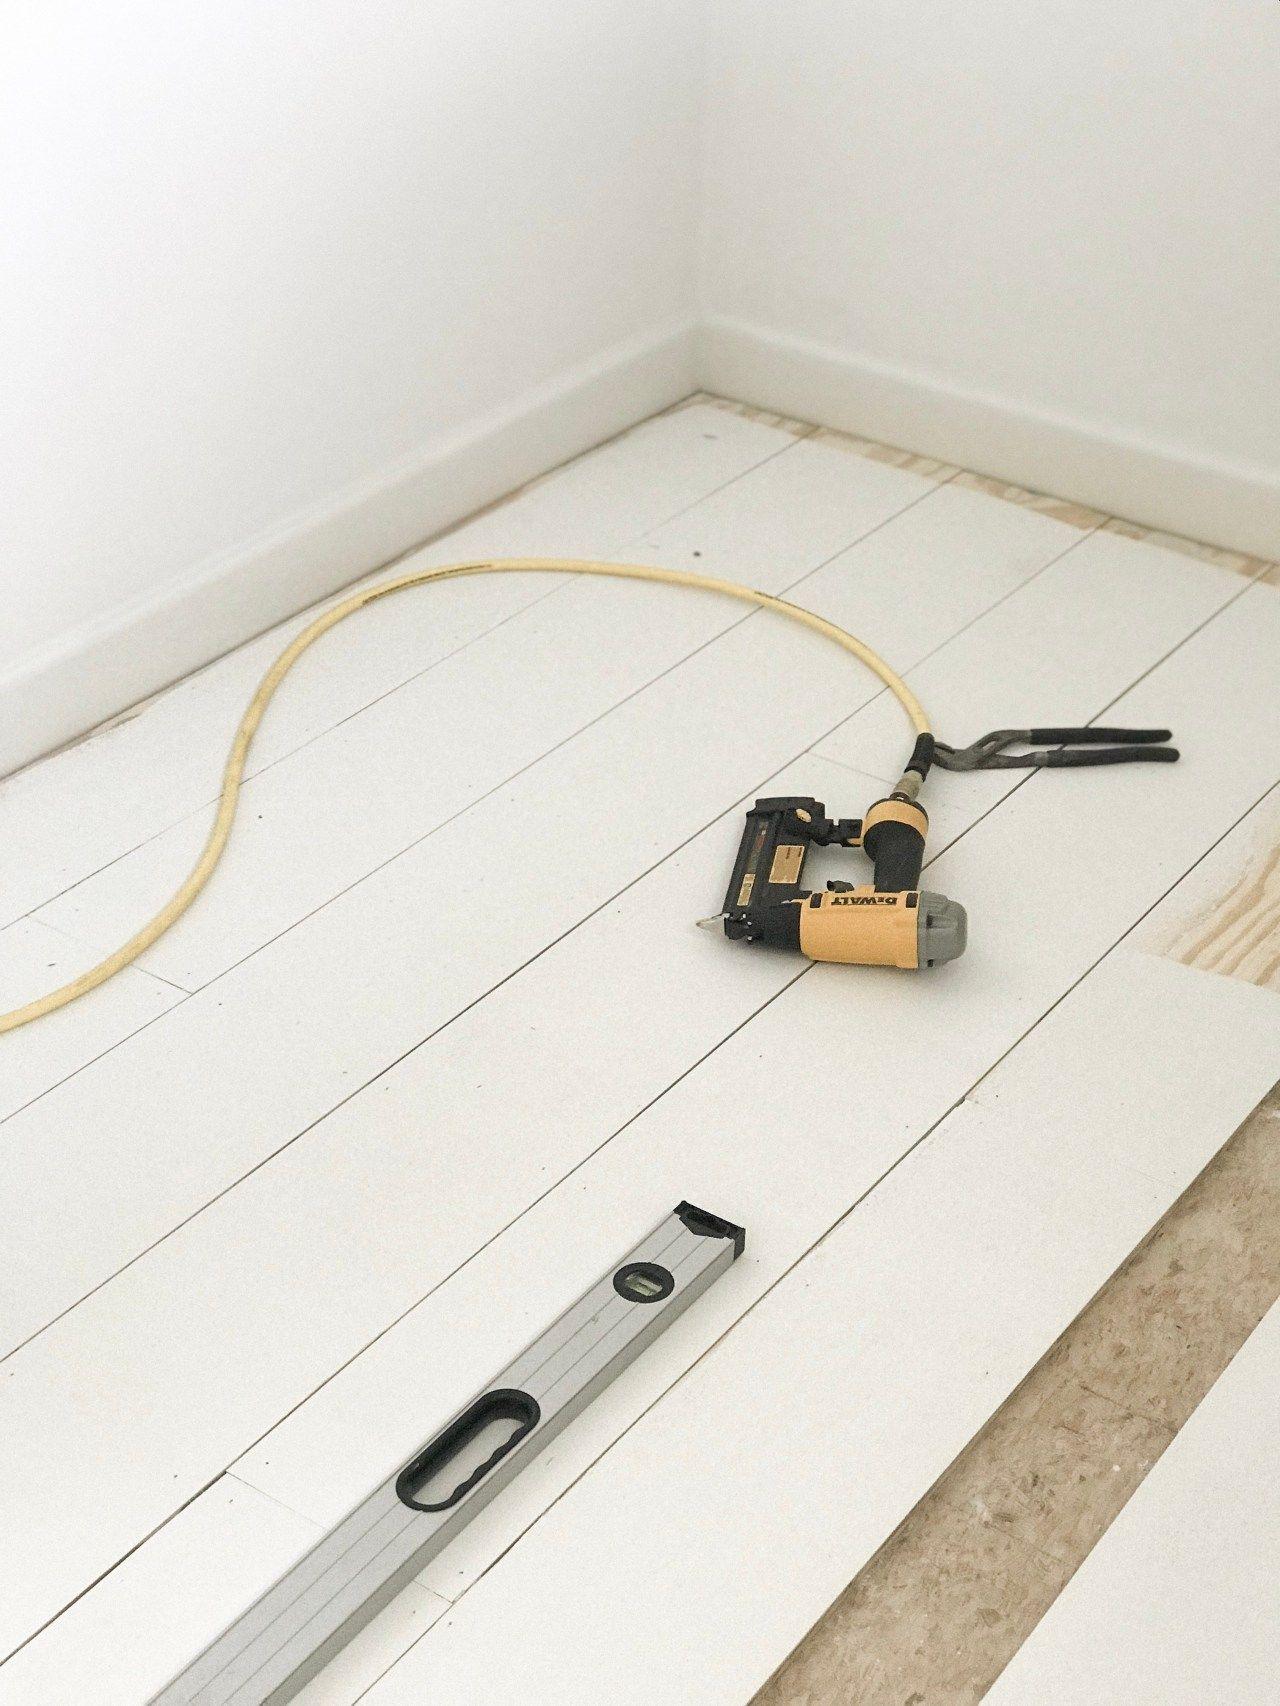 Diy Plywood Plank Flooring Plank Flooring Plywood Plank Flooring Diy Wood Floors